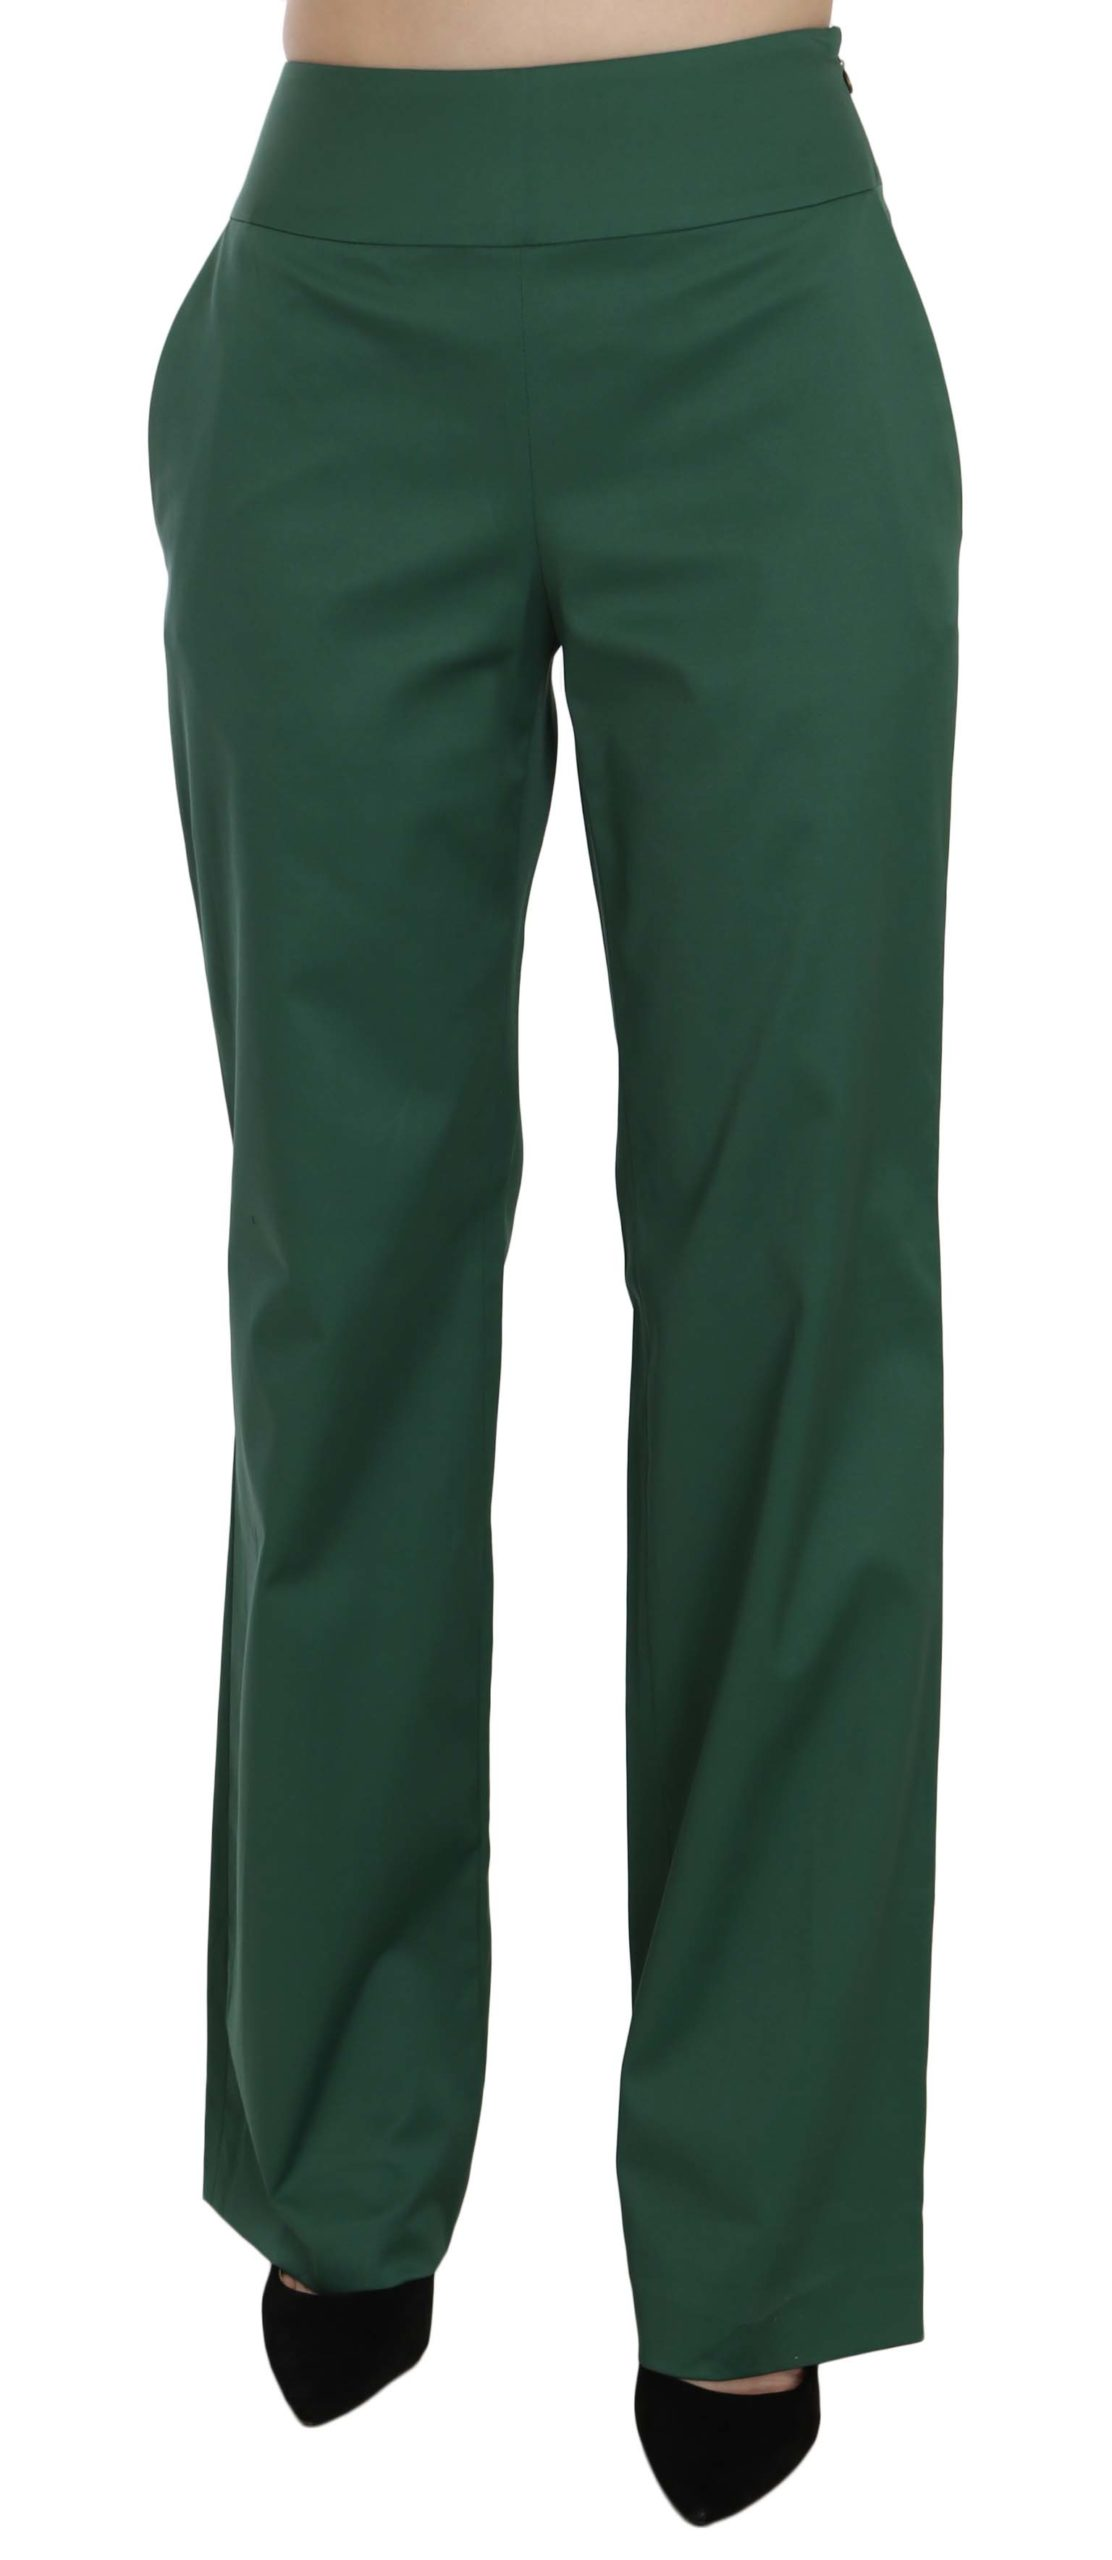 Just Cavalli Women's High Waist Straight Formal Trouser Green PAN70325 - IT38 XS